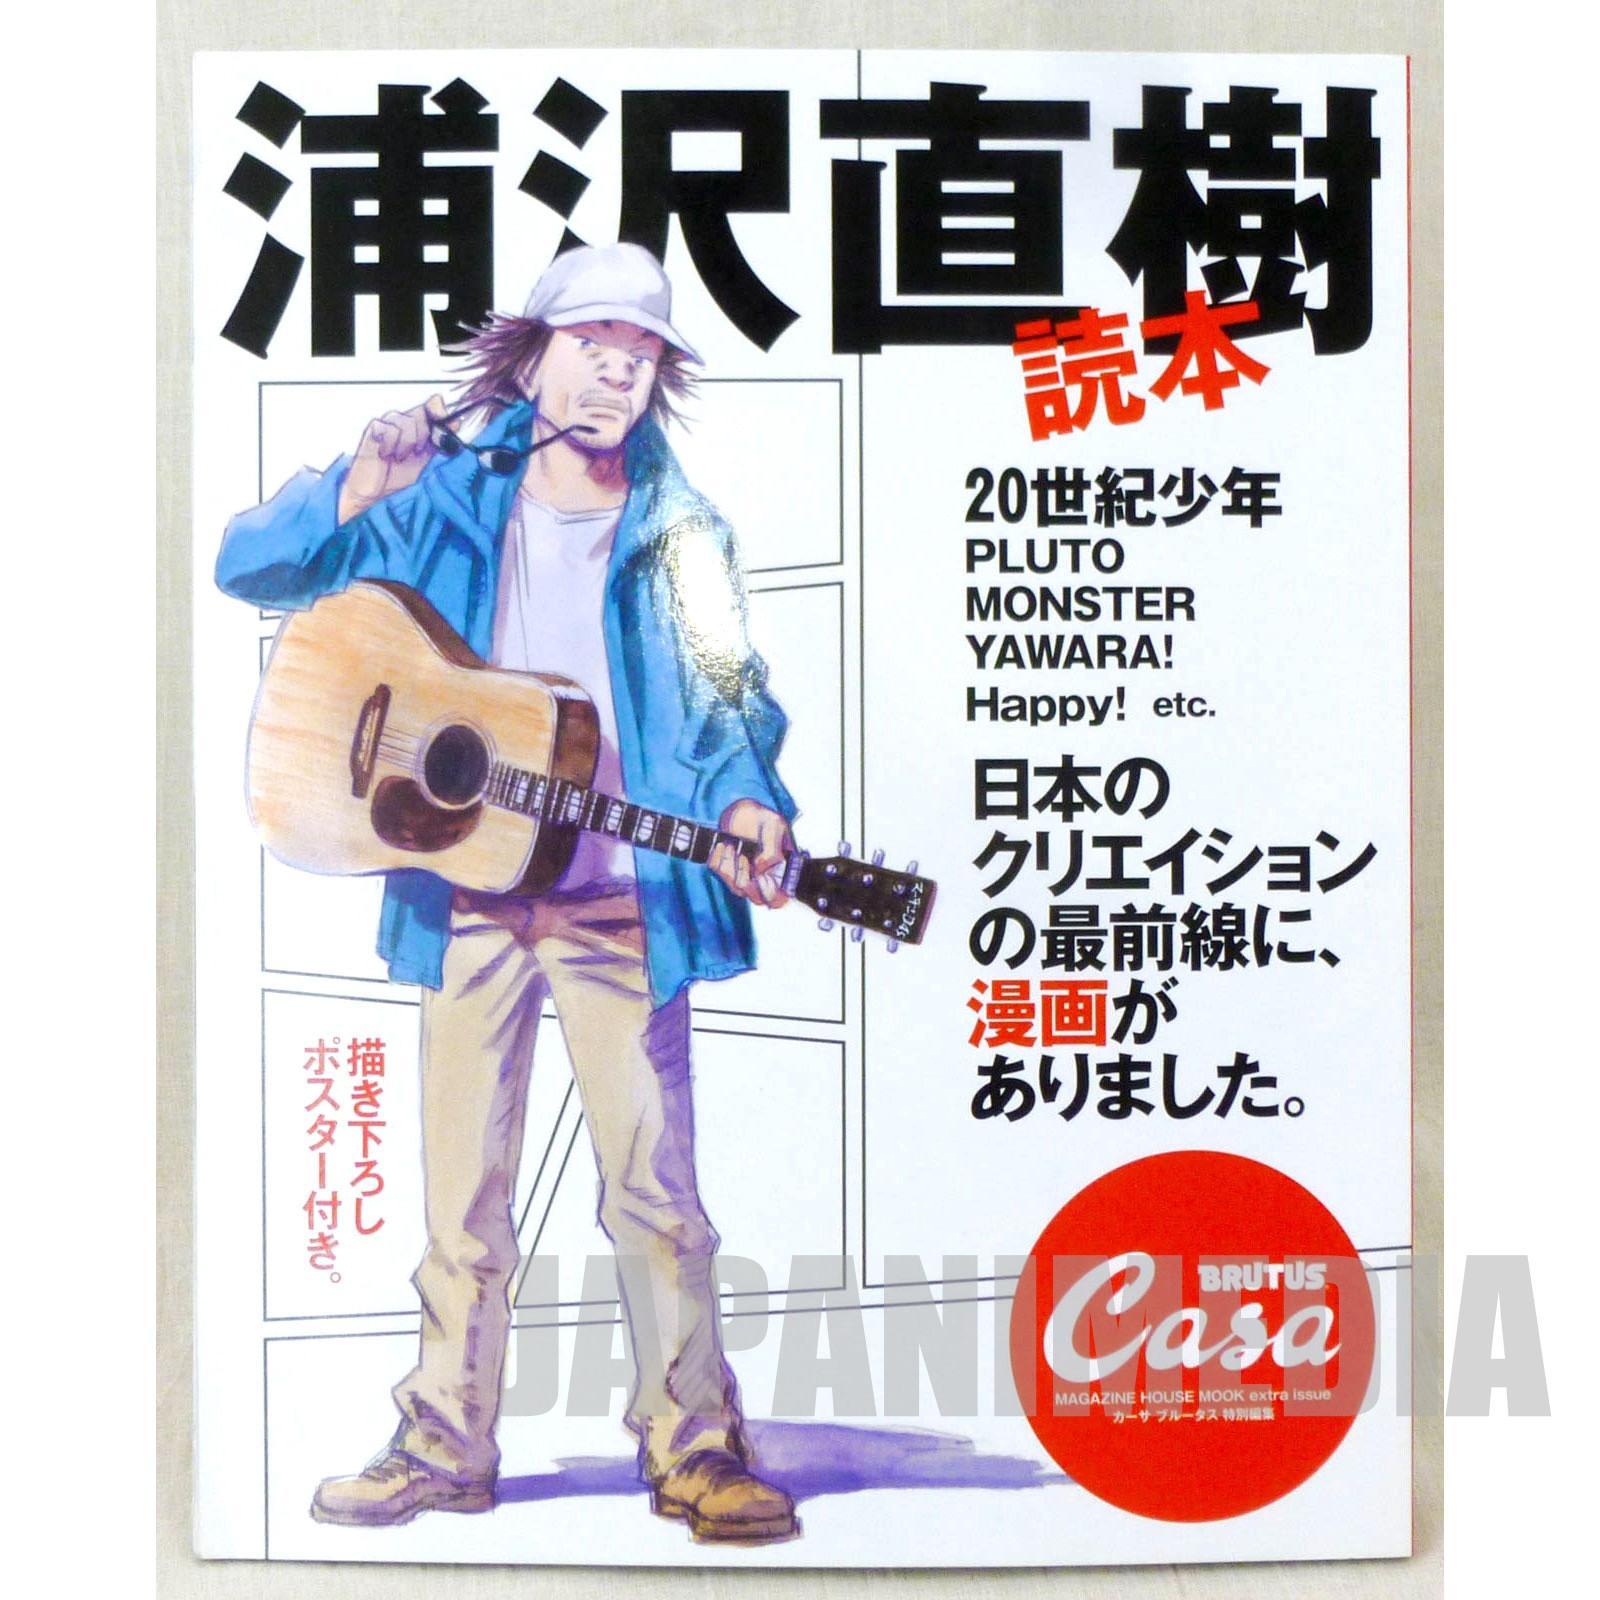 Case Brutus Extra Issue Naoki Urasawa's Mega Creation! with Poster Magazine House Mook JAPAN